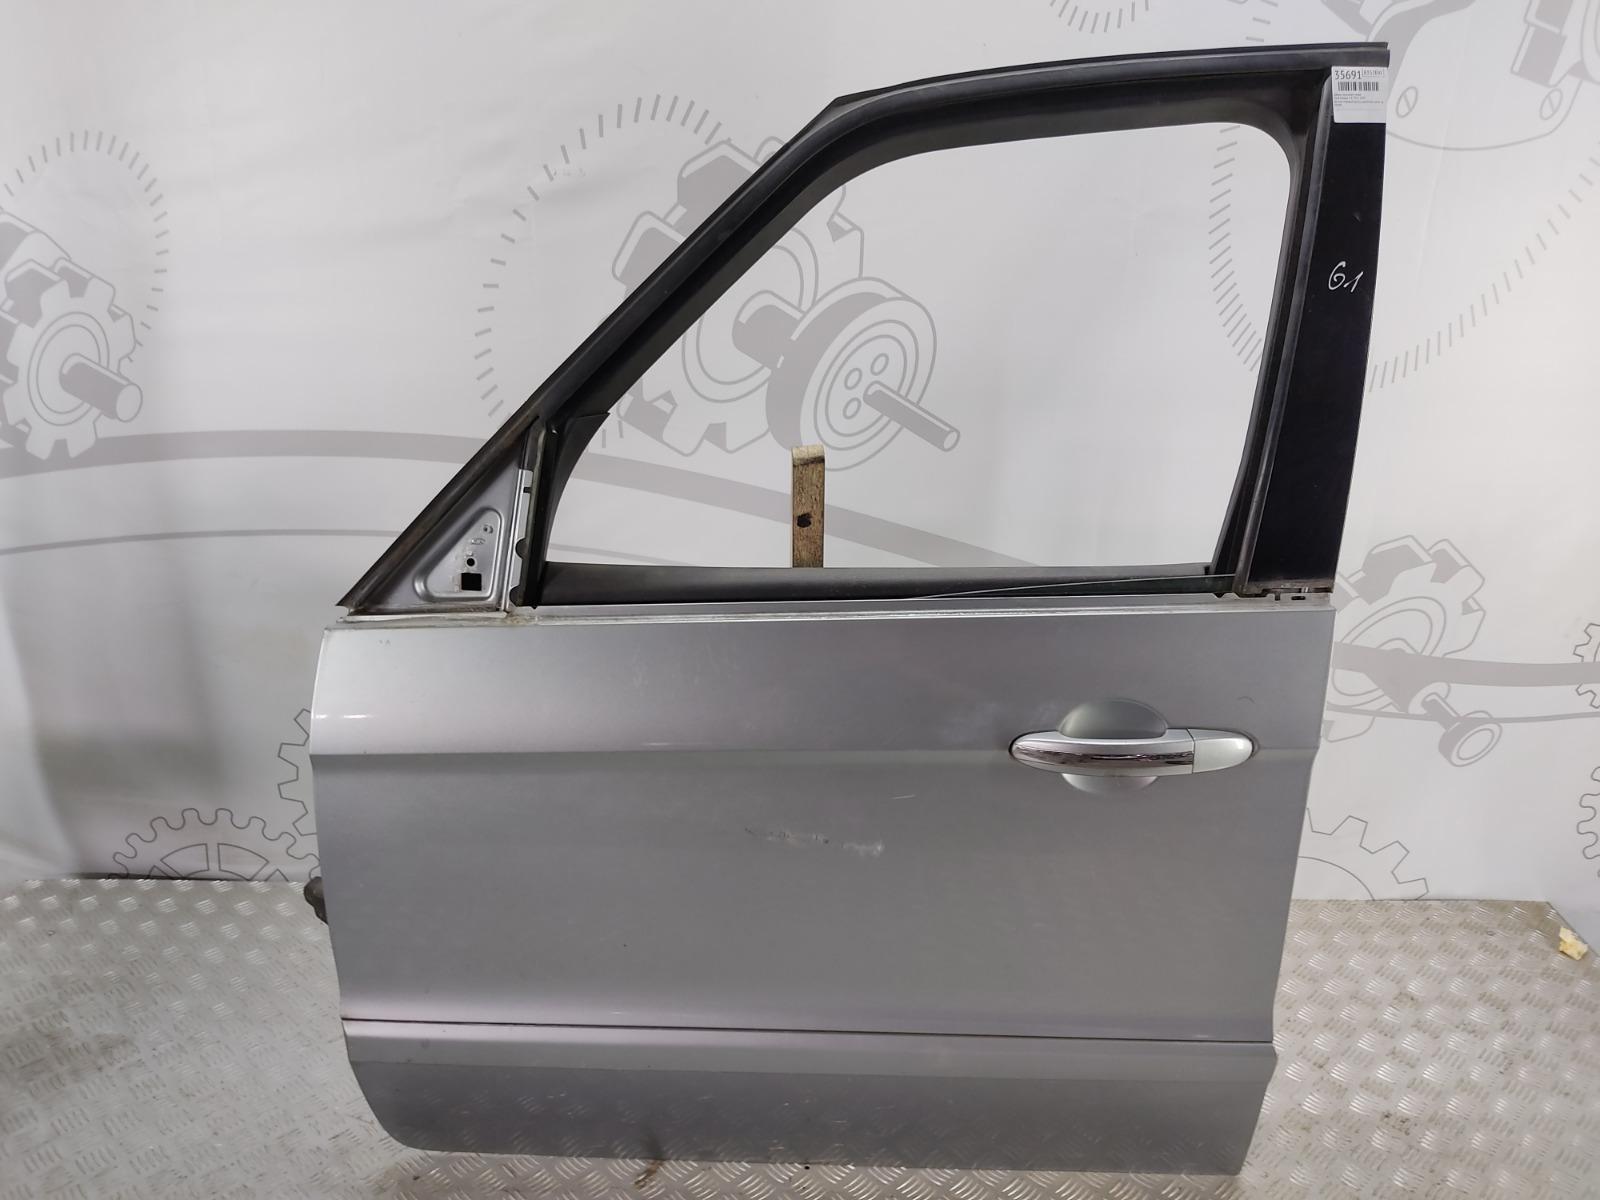 Дверь передняя левая Ford Galaxy 1.8 TDCI 2007 (б/у)